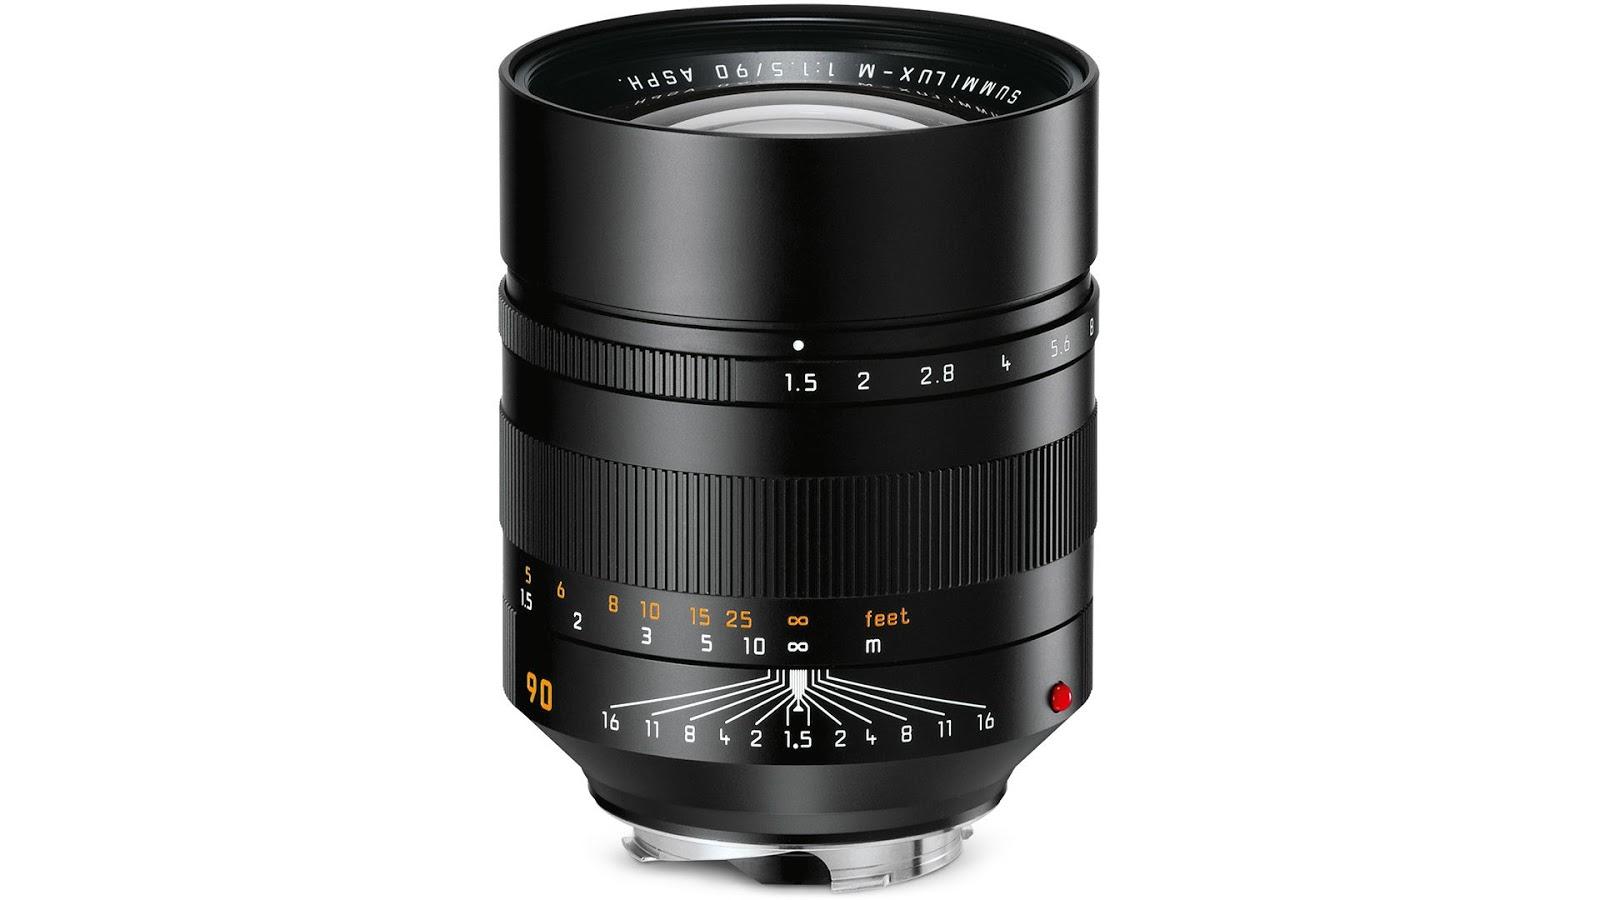 Leica Summilux-M 90mm f/1.5 ASPH